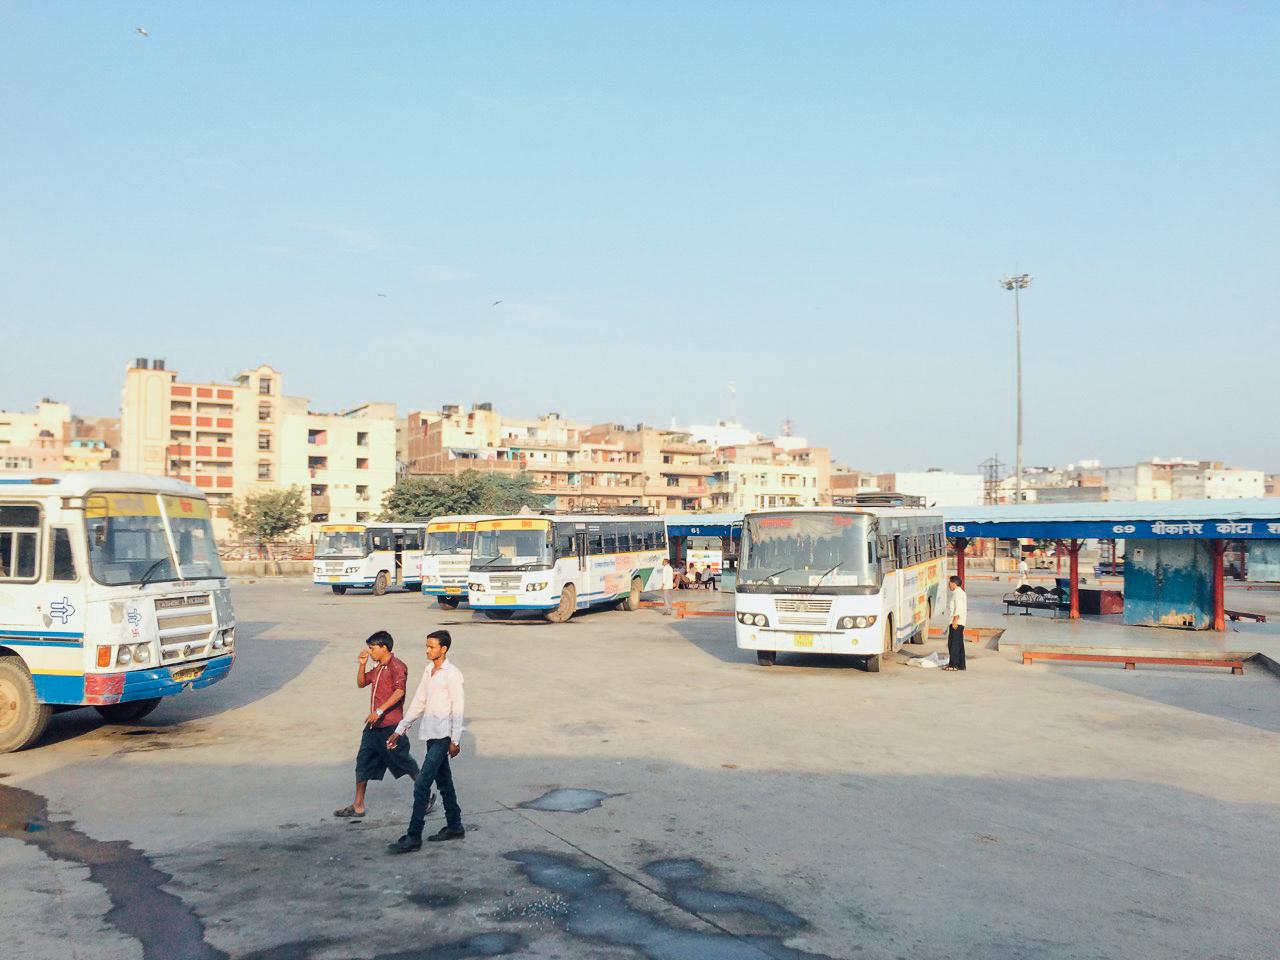 Путешествие по Индии: Терминал Veer Hakikat Rai ISBT, Дели